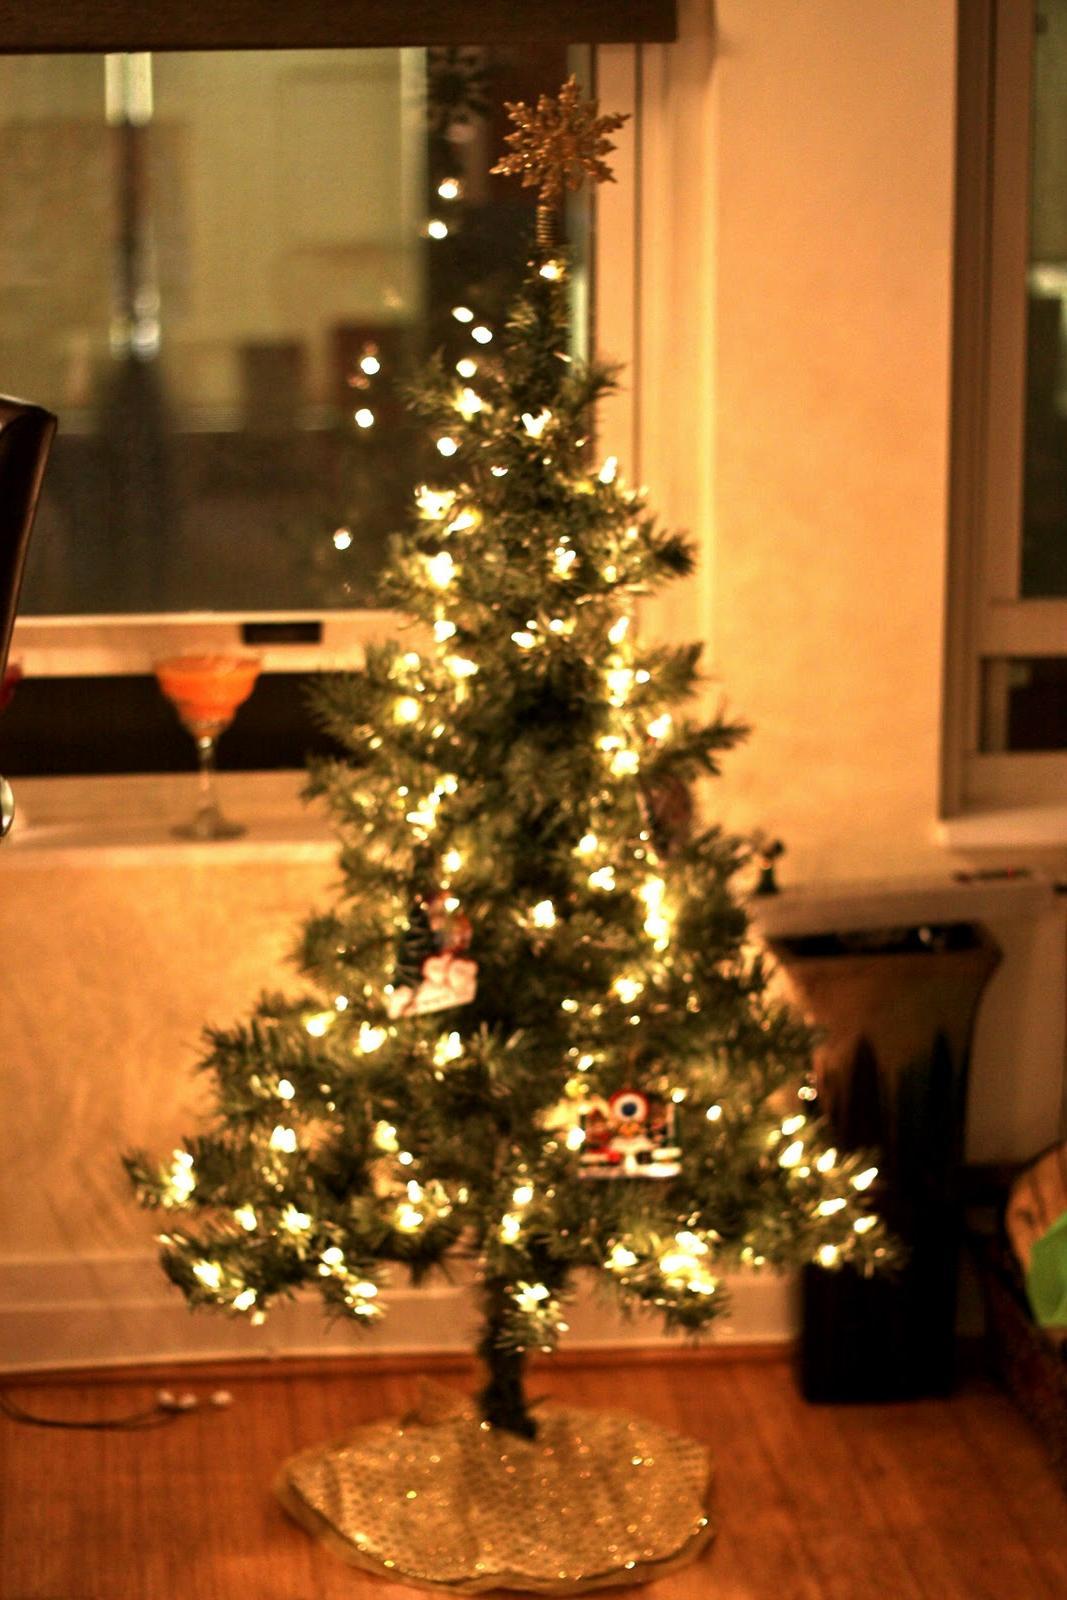 snowflake and tree skirt!